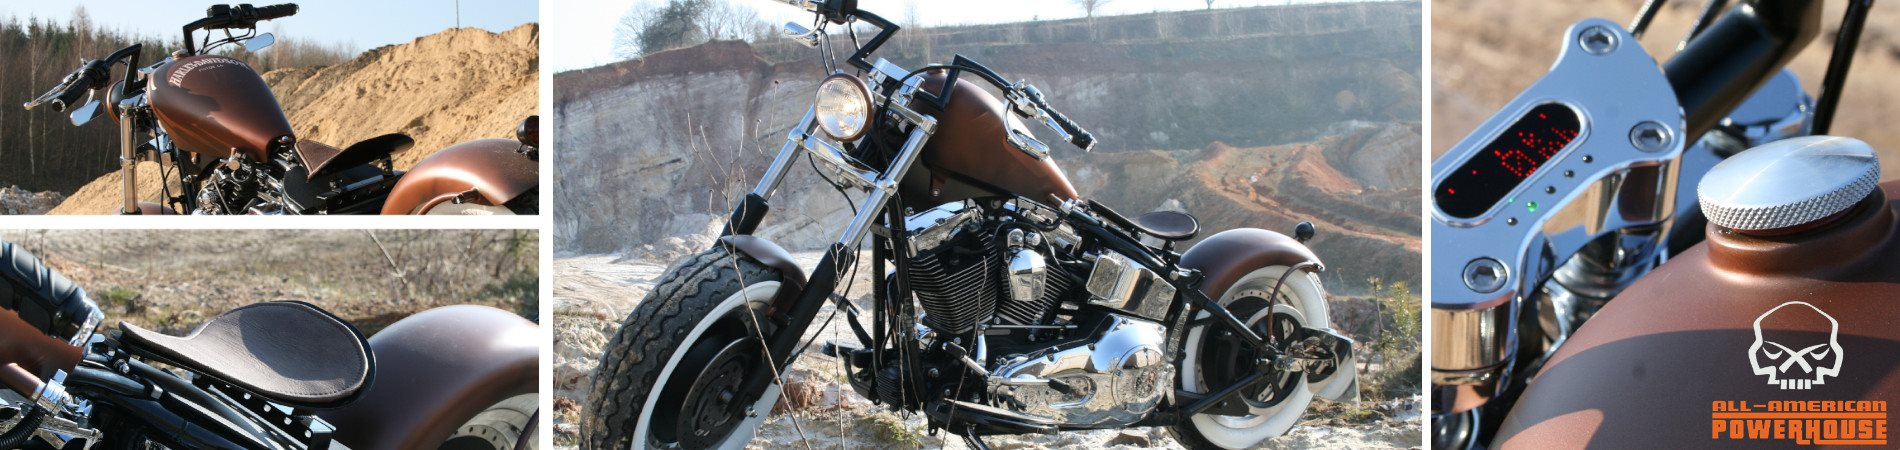 harley umbauten biker s point fuchs gmbh co kg. Black Bedroom Furniture Sets. Home Design Ideas